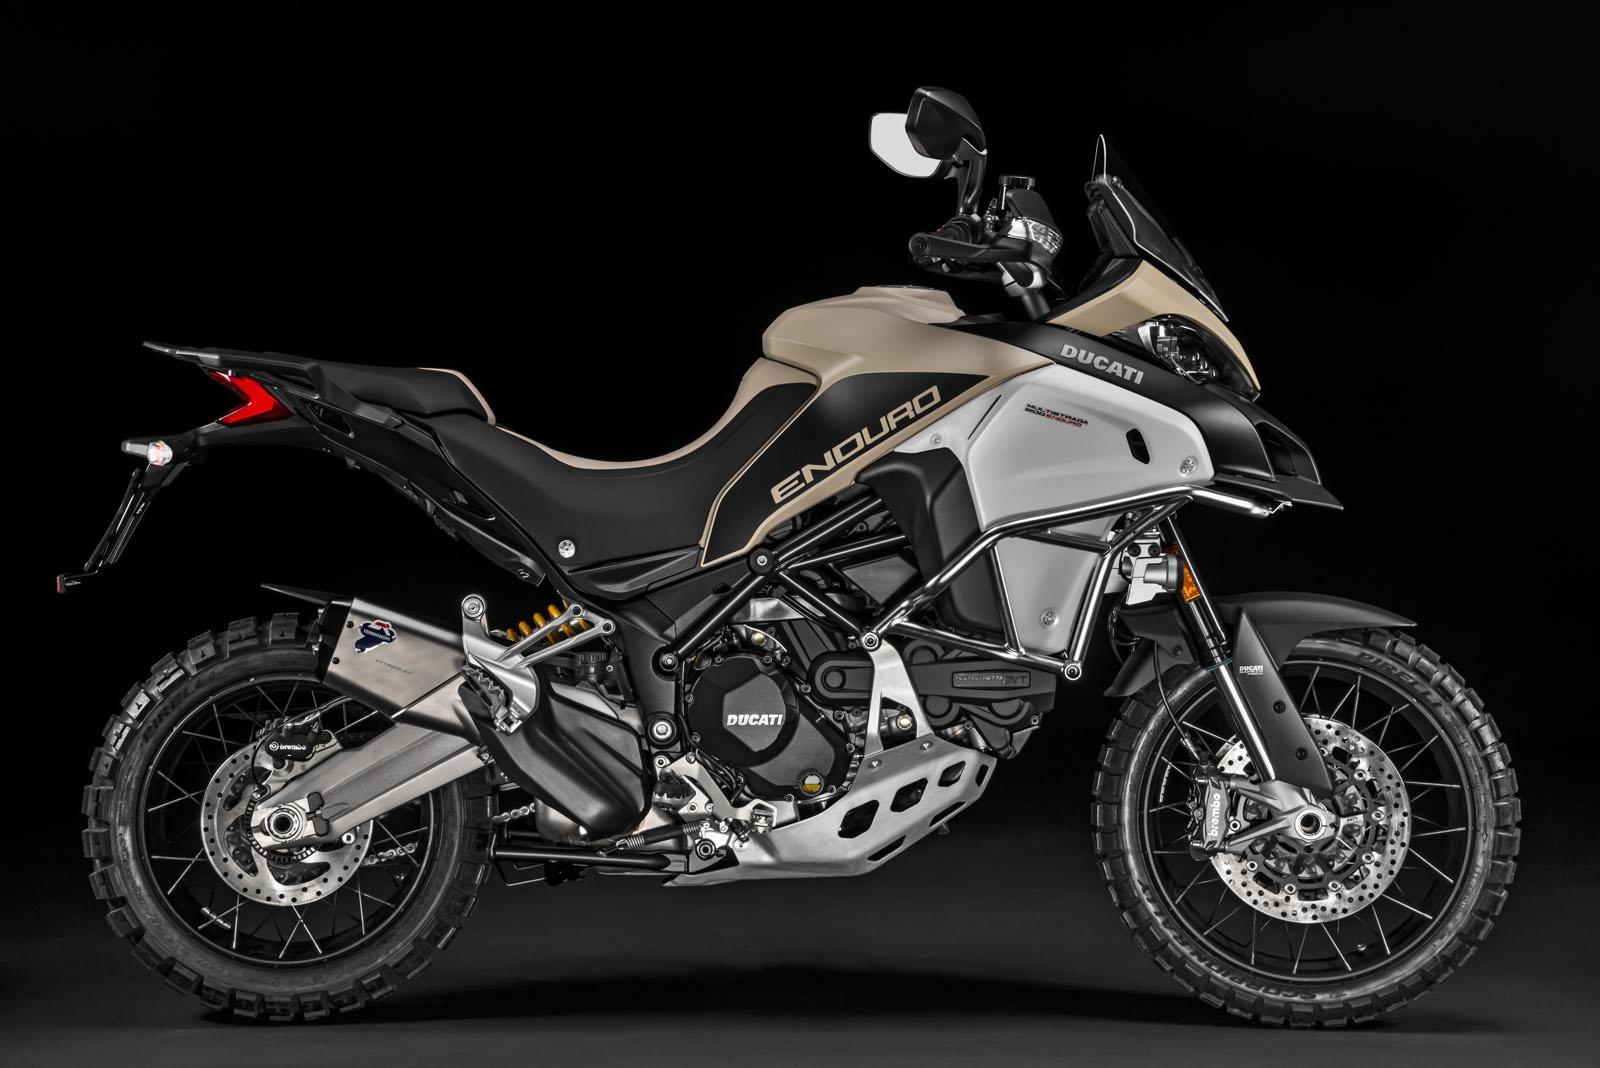 Precios de Ducati Multistrada 1200 Enduro Pro